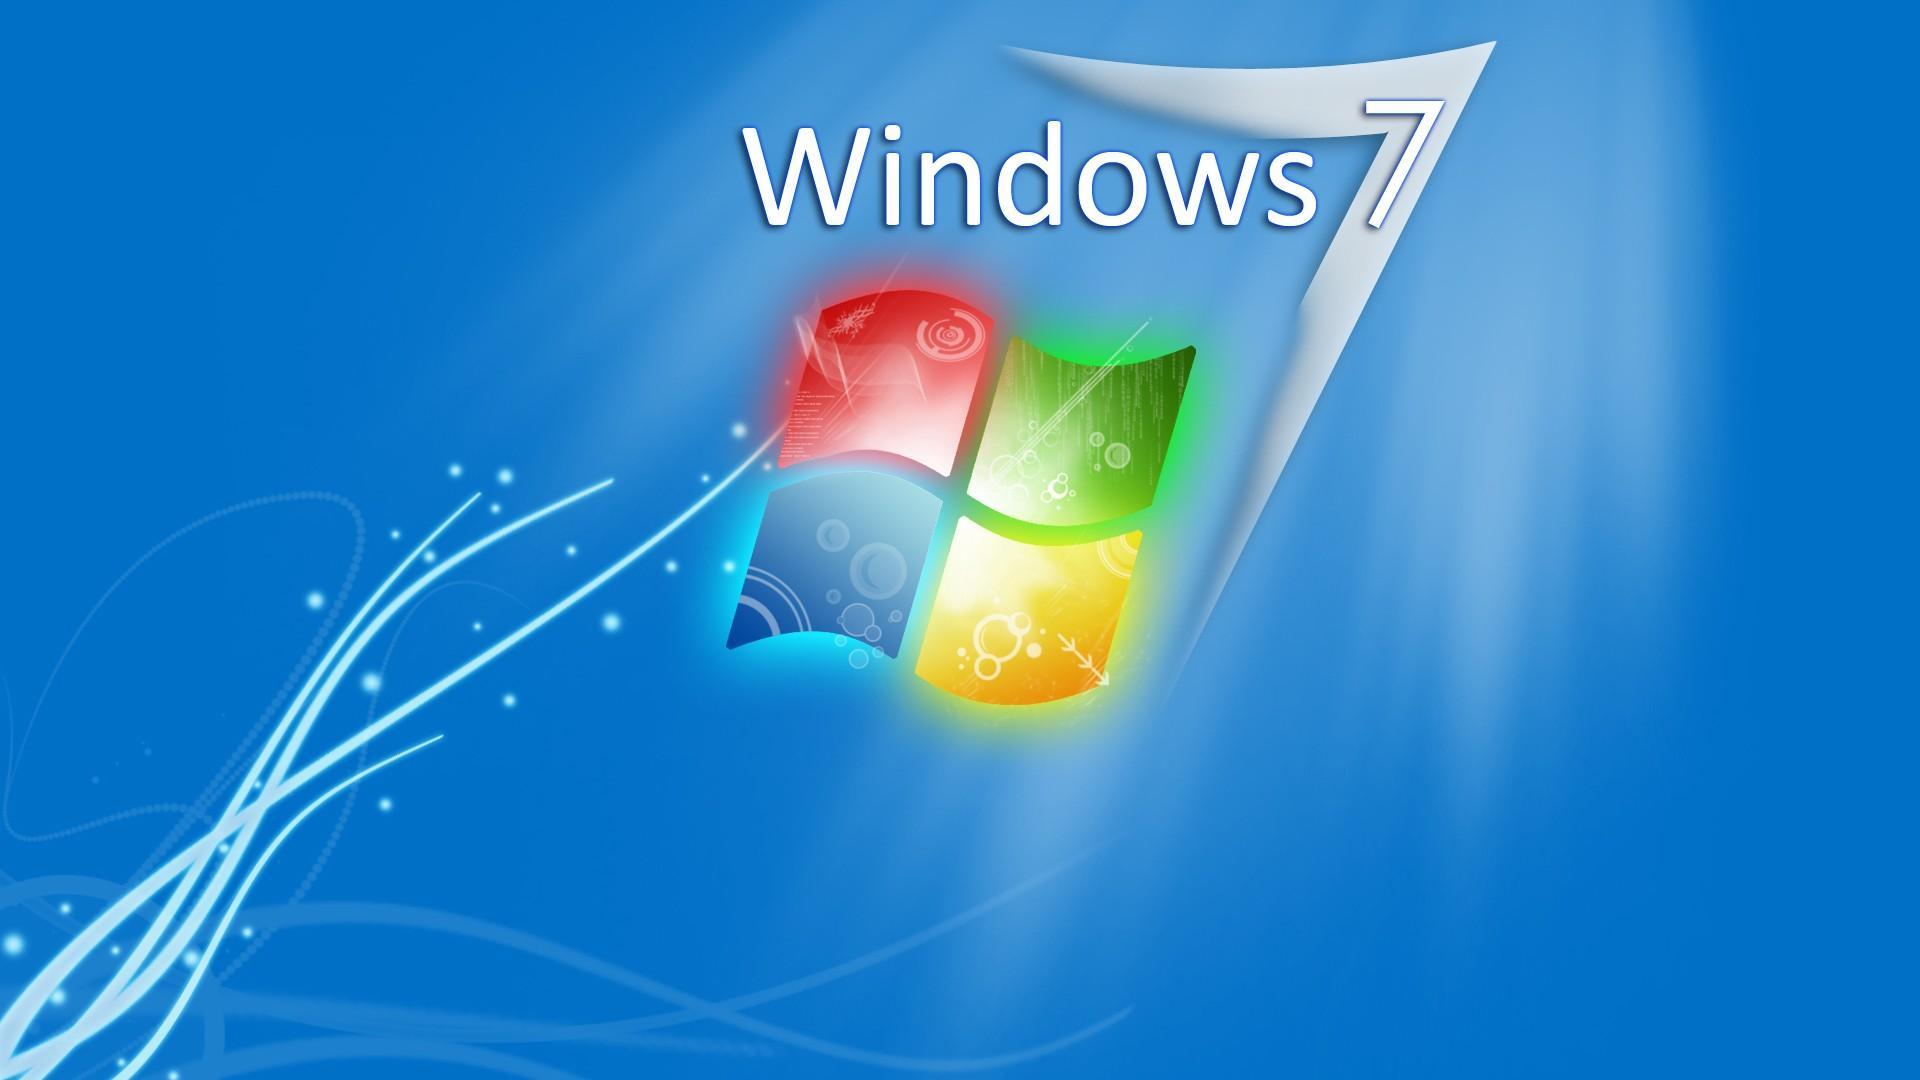 обои рабочего стола windows 7 природа 2390